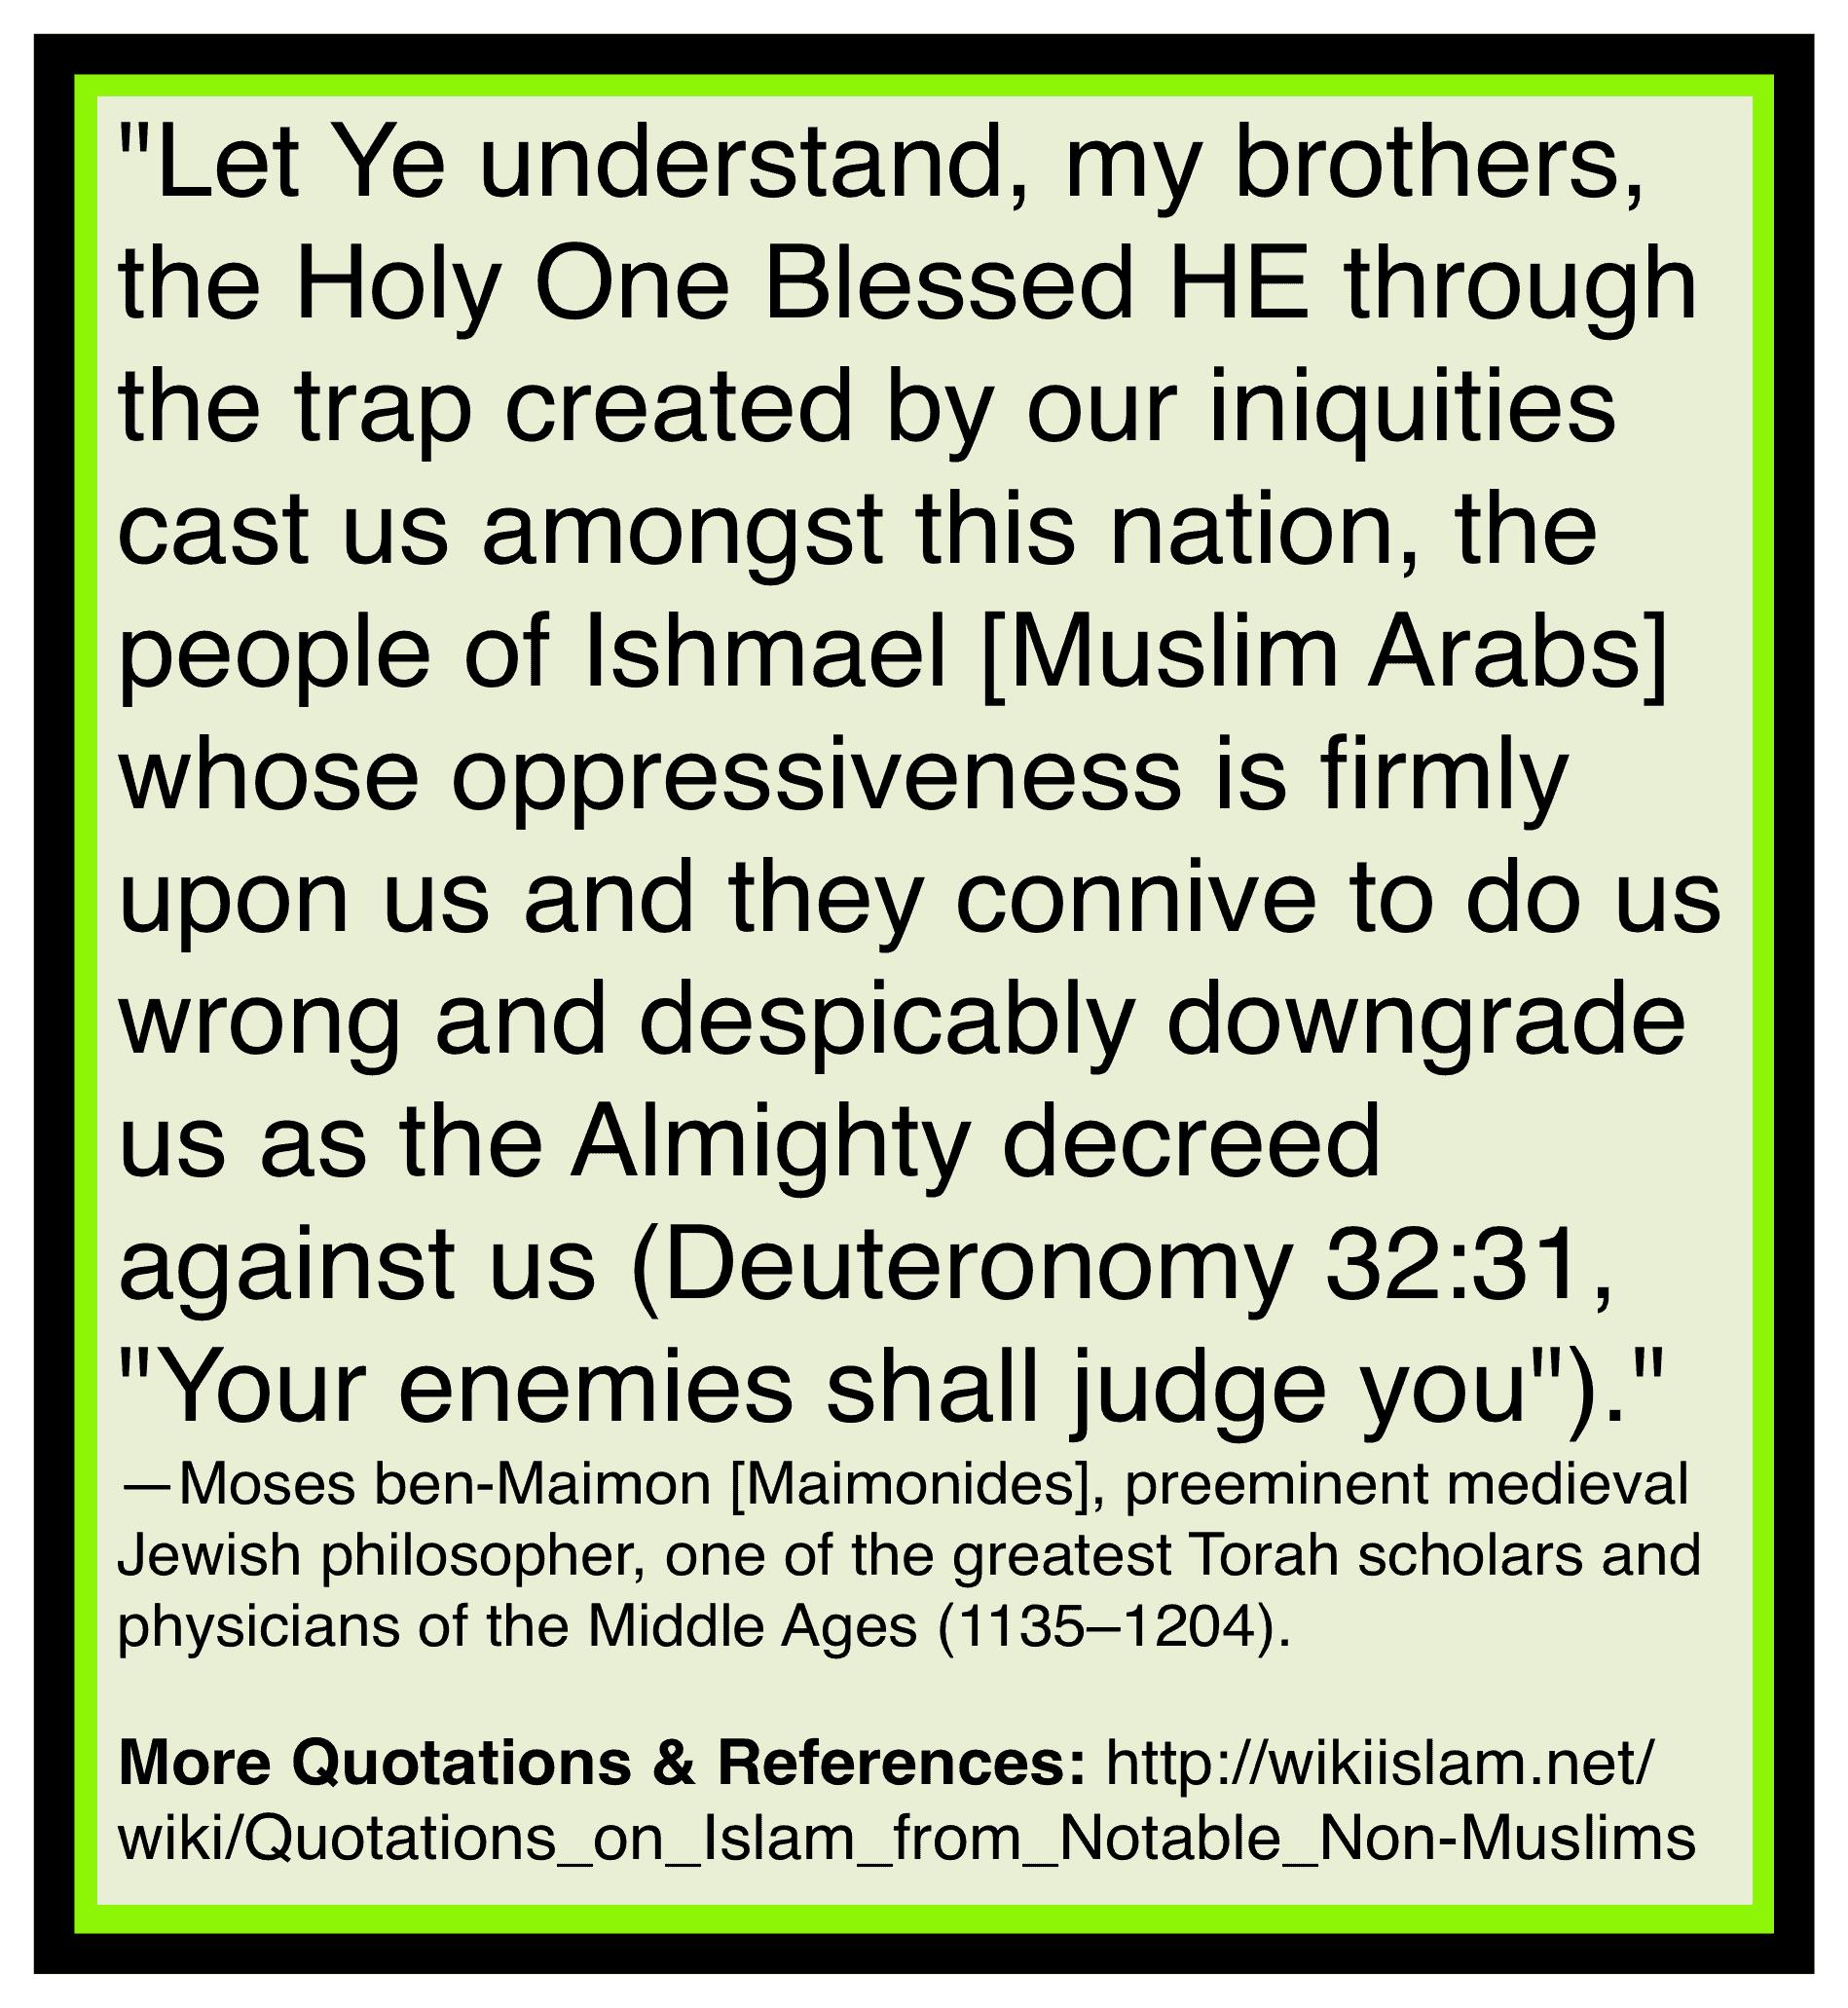 Islam brings war to the Jews